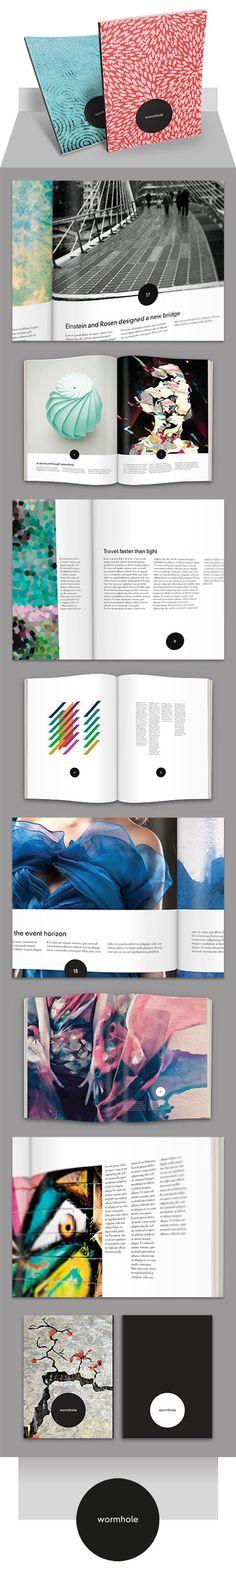 Portfolio Corsi Ilas - Francesco Leonardo, Docente: Alessandro Cocchia, Categoria: Graphic Design - © ilas 2013